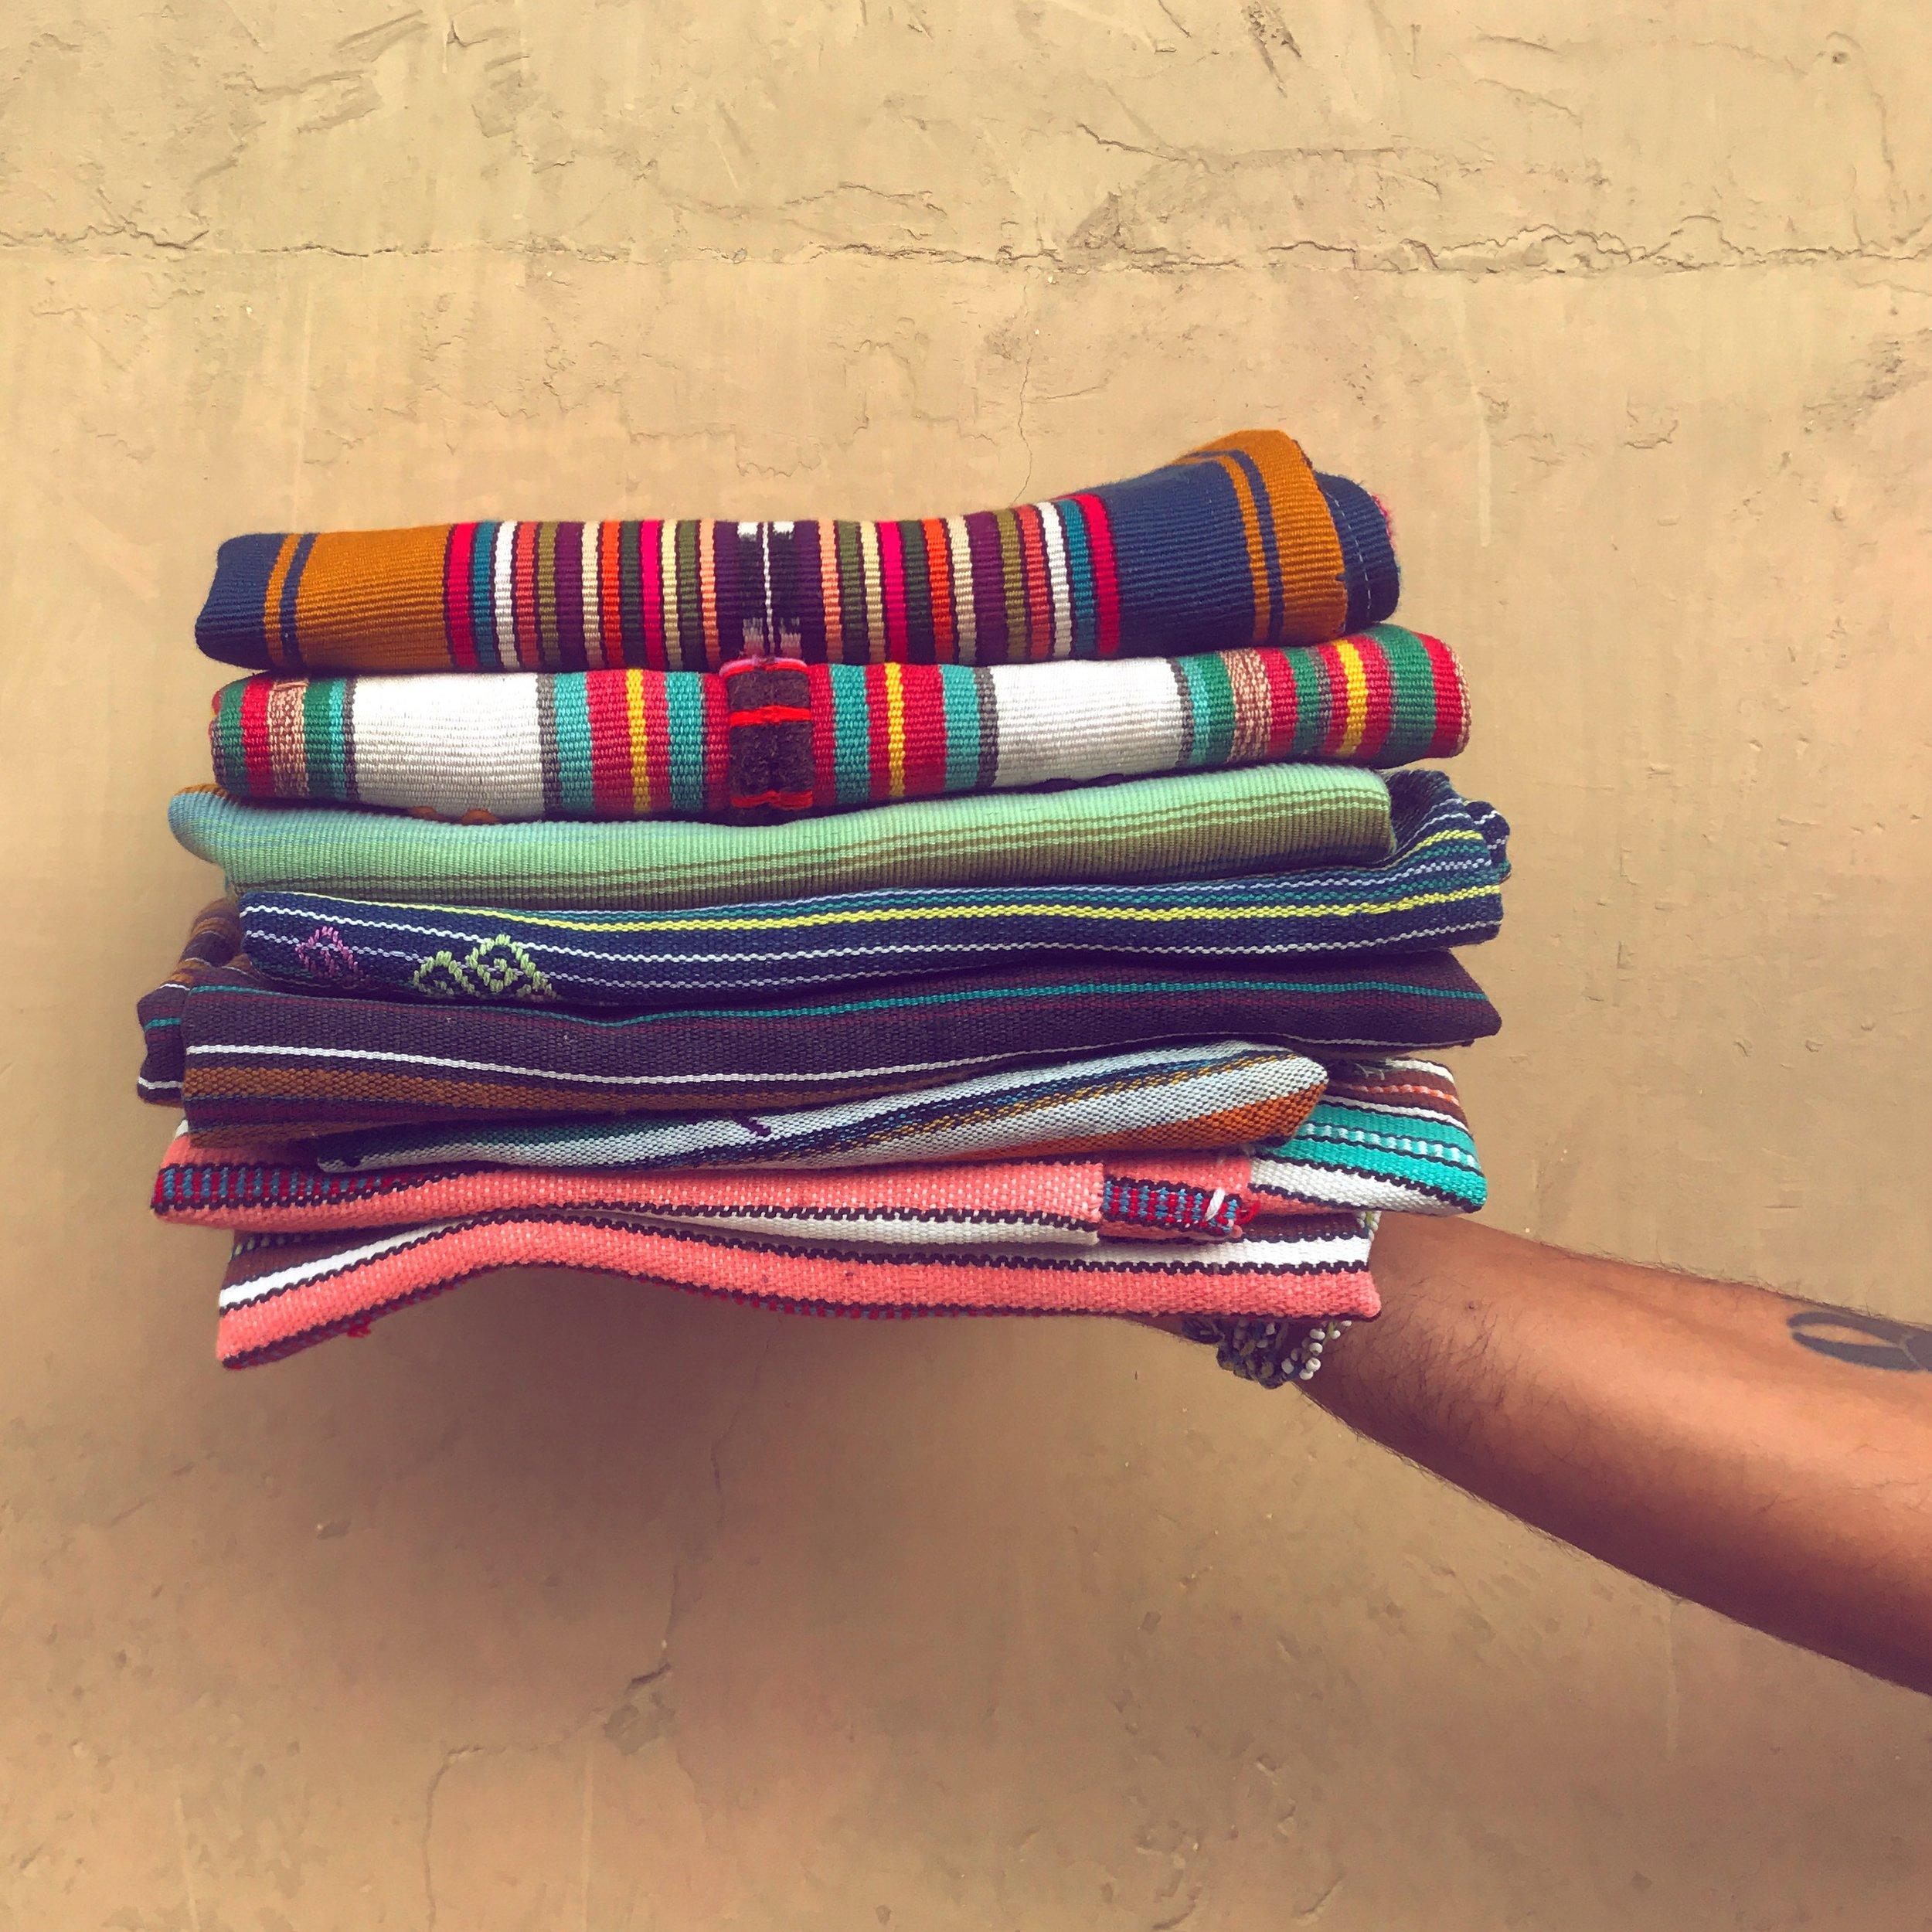 luna zorro vintage textile collection.jpg